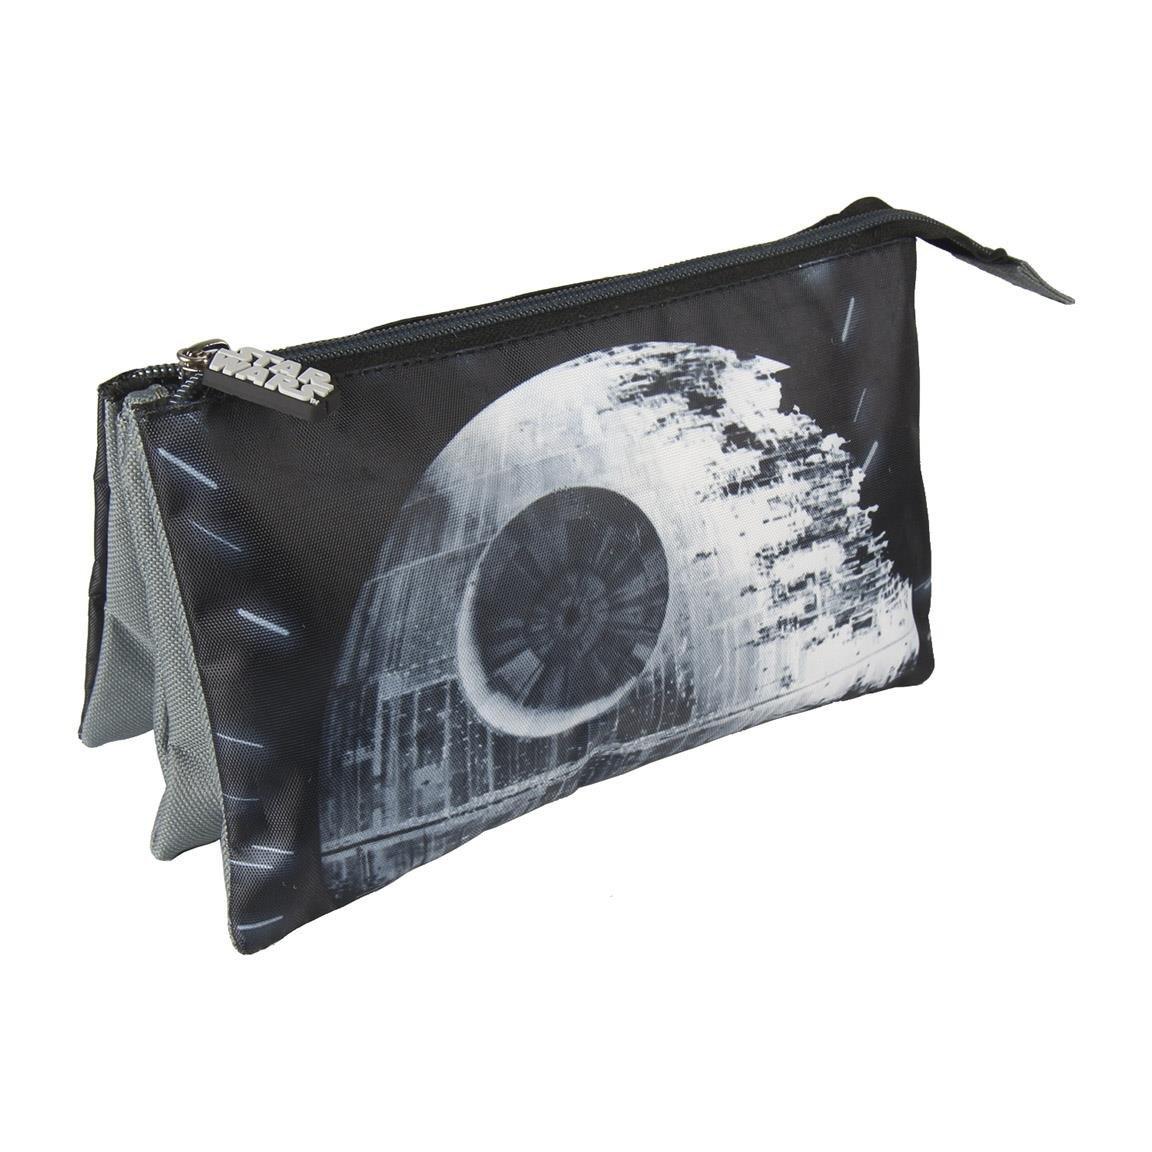 Cerdá Star Wars Beauty Case, 22 cm, Nero (negro) 2100002147